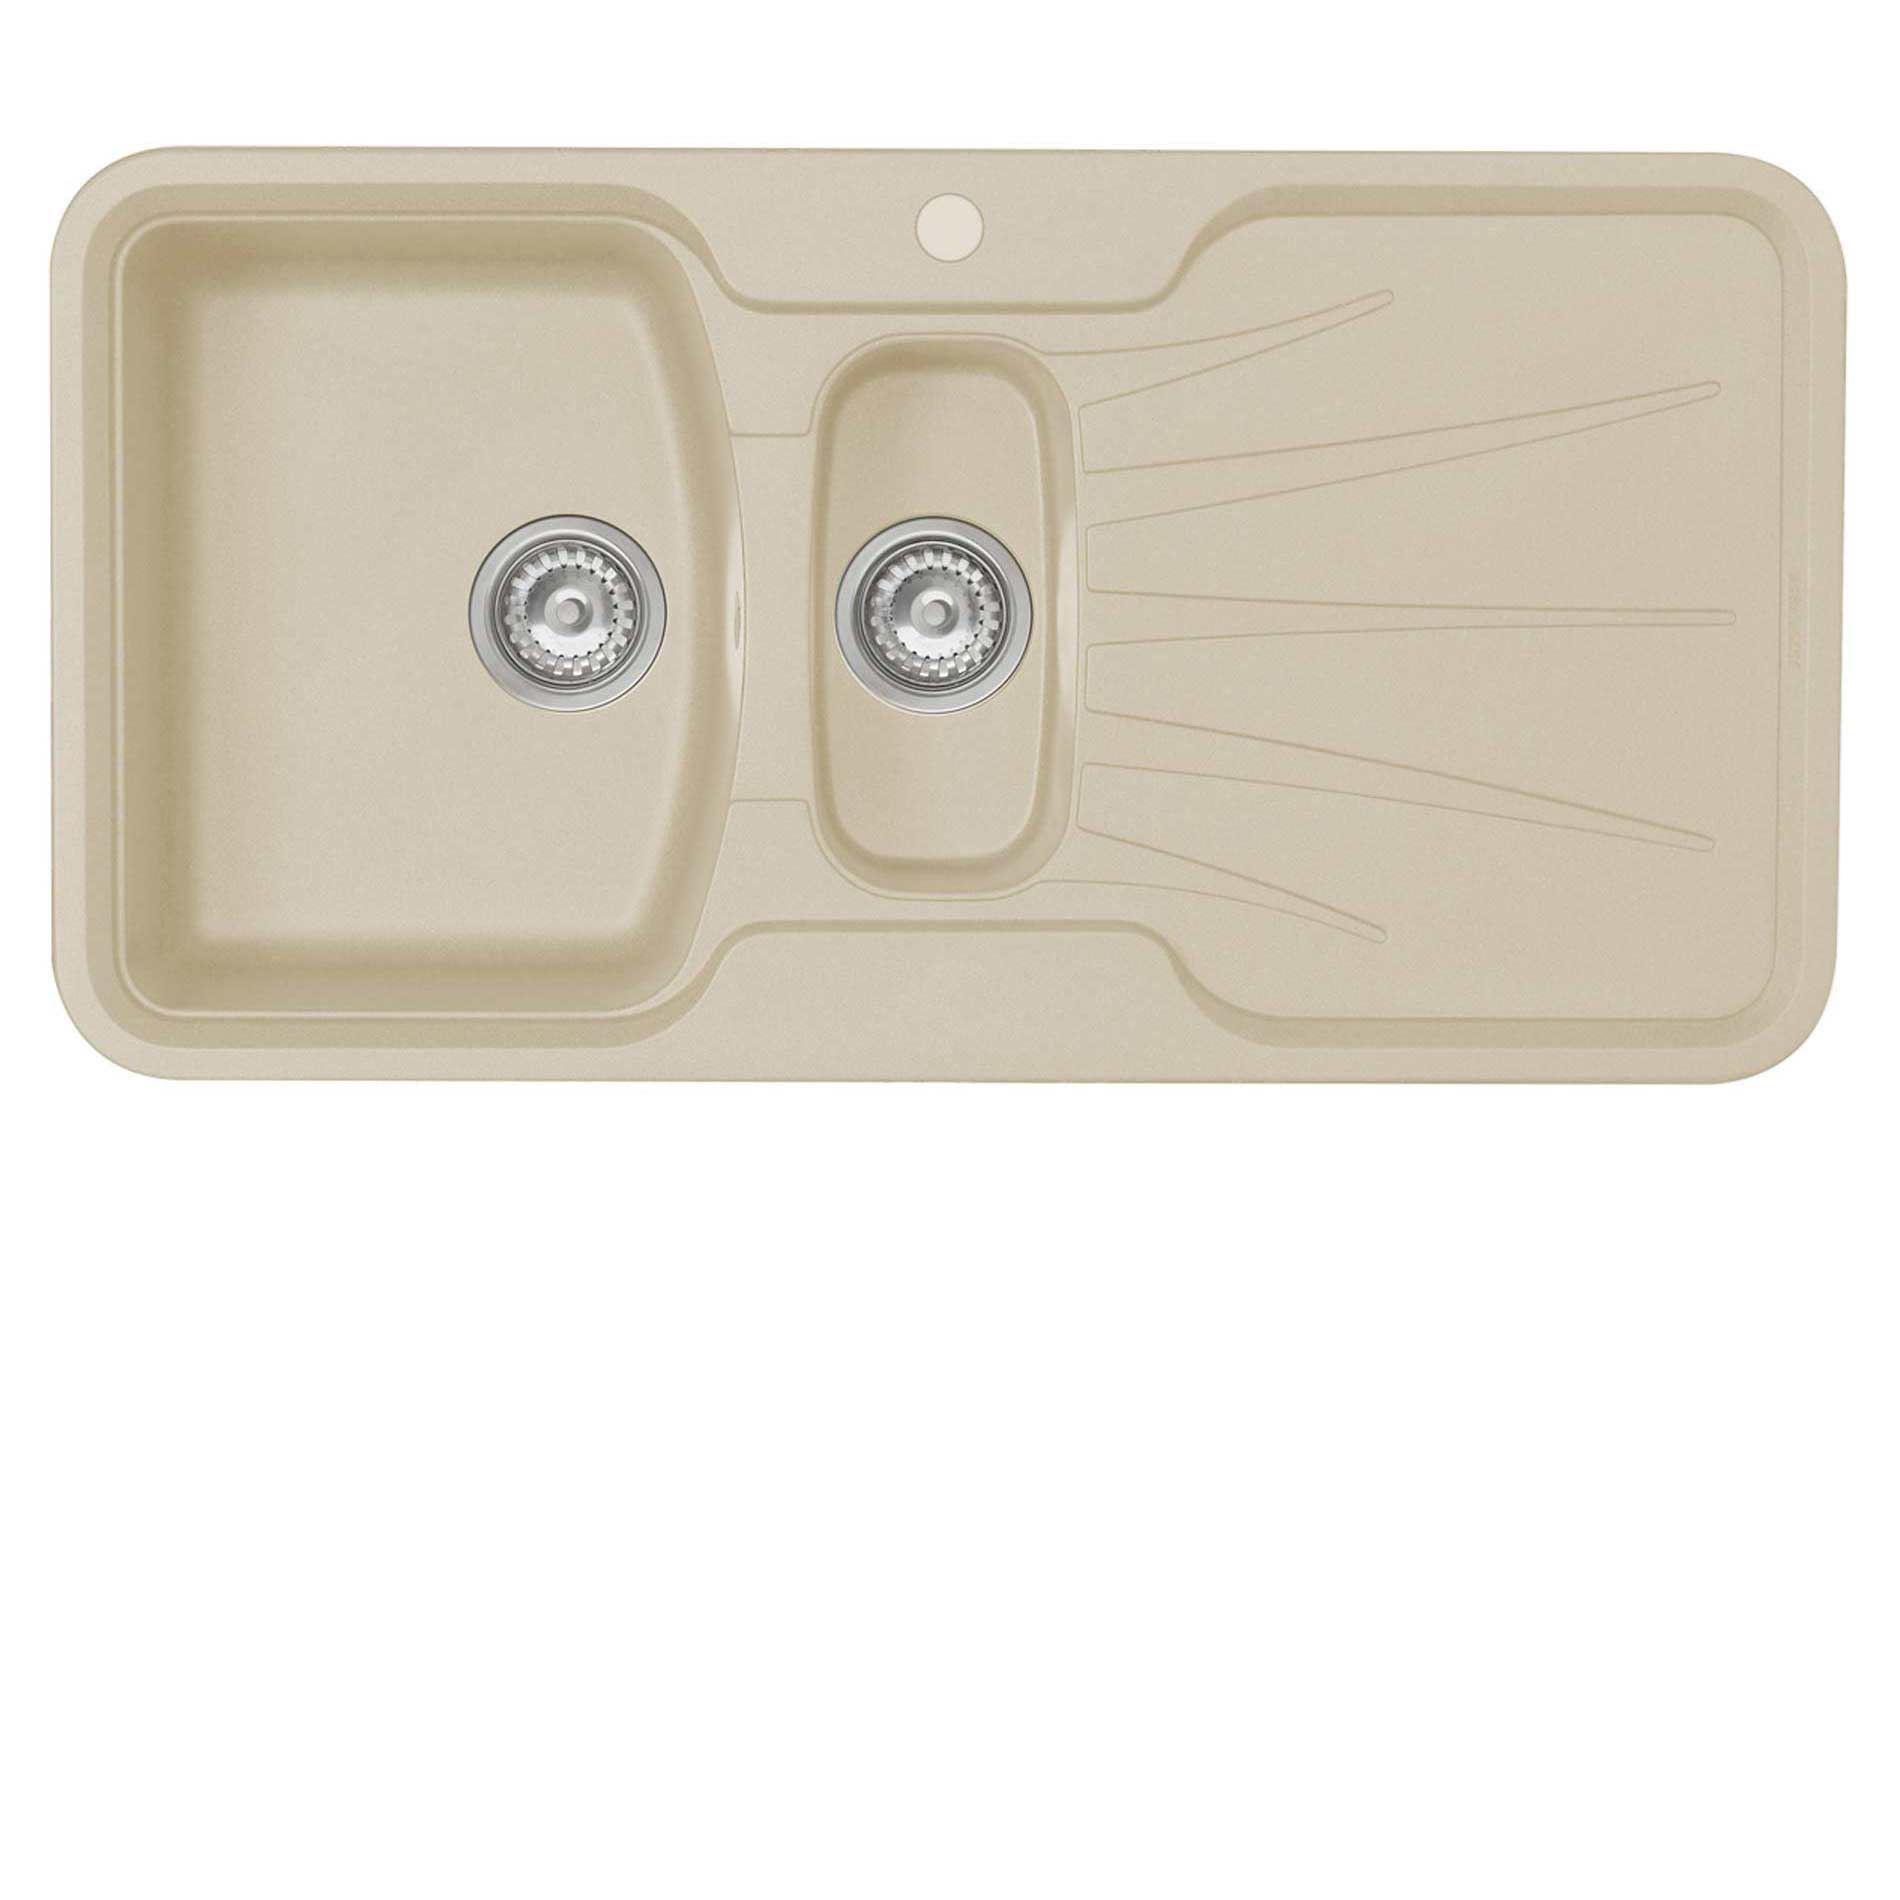 picture of korona 1 5 granite rok sahara beige sink astracast  korona 1 5 granite rok sahara beige sink   kitchen      rh   kitchensinksandtaps co uk